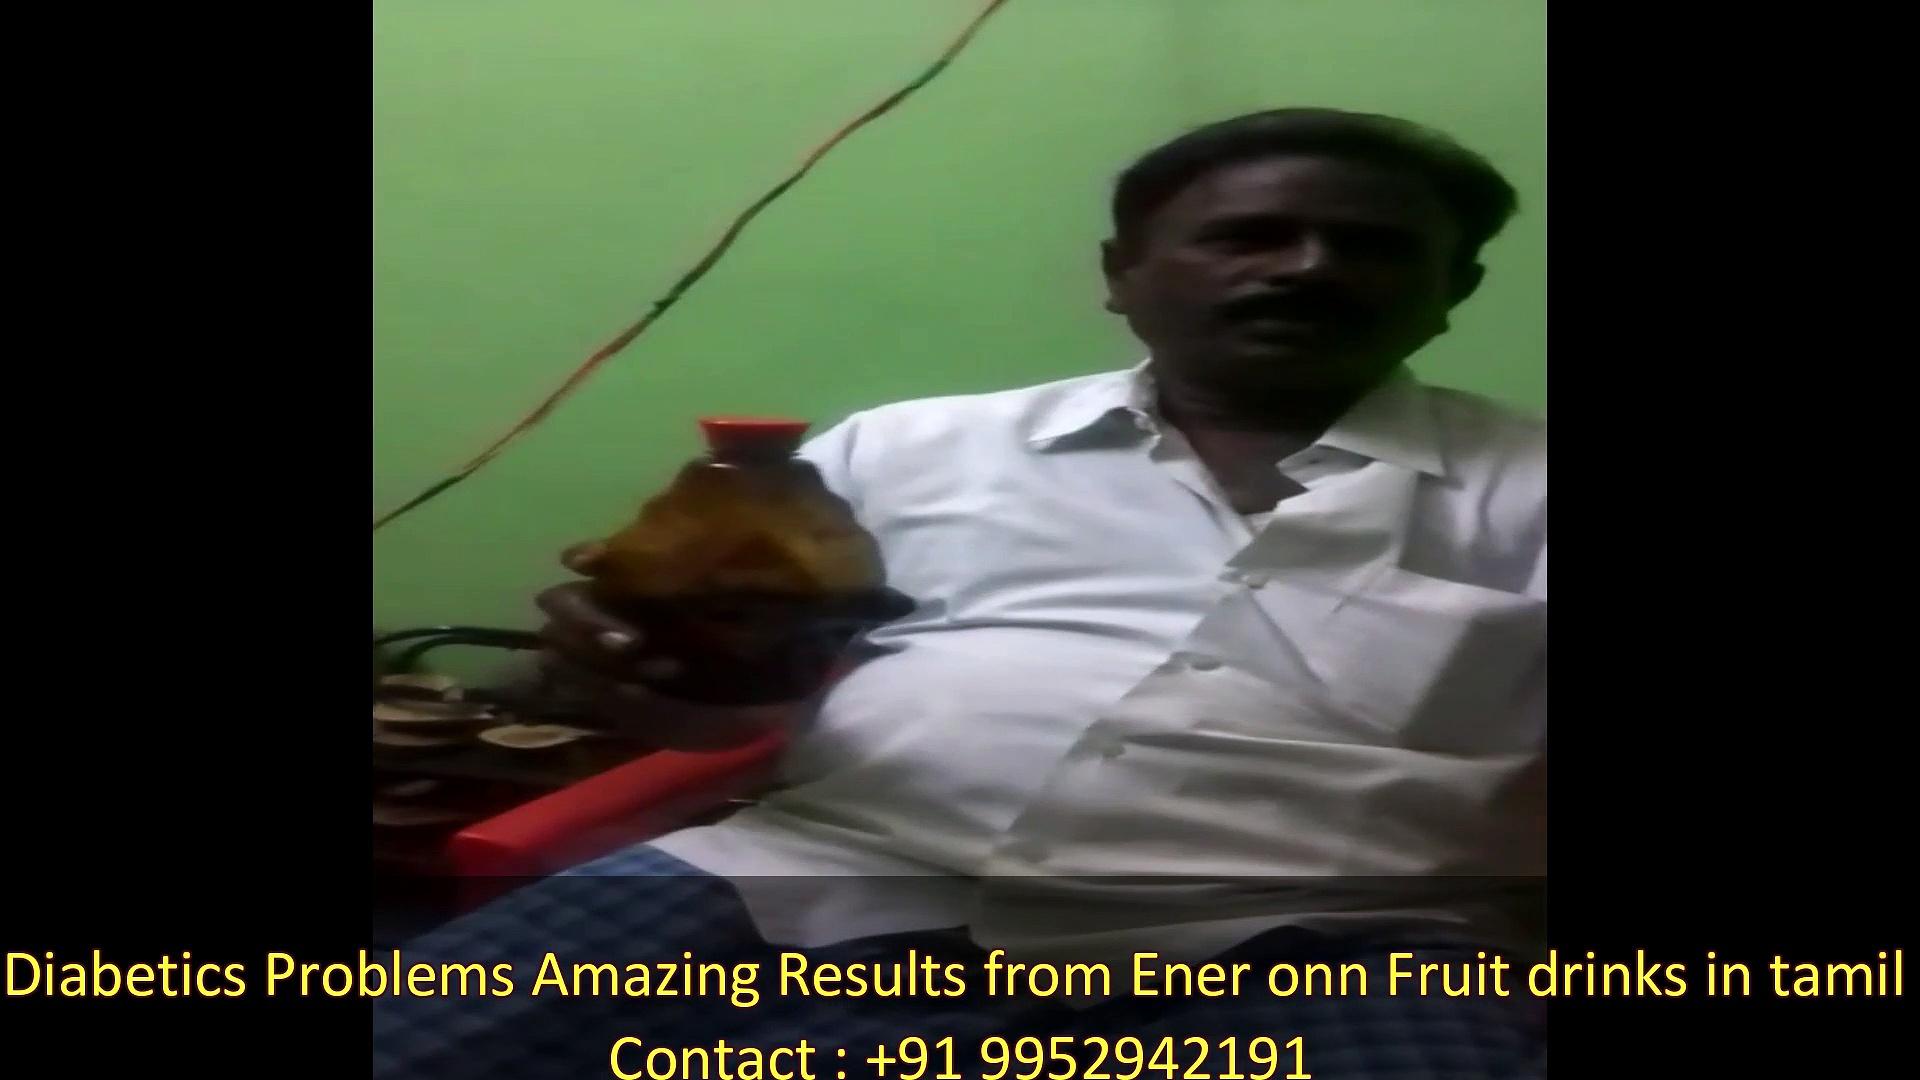 Diabetics Problems Amazing Results from Ener onn Fruit drinks in tamil – சர்க்கரை நோய் பிரச்சனைகளிலிருந்து  தீர்வு பெற Ener onn பழ பானங்களை பருகுங்கள்